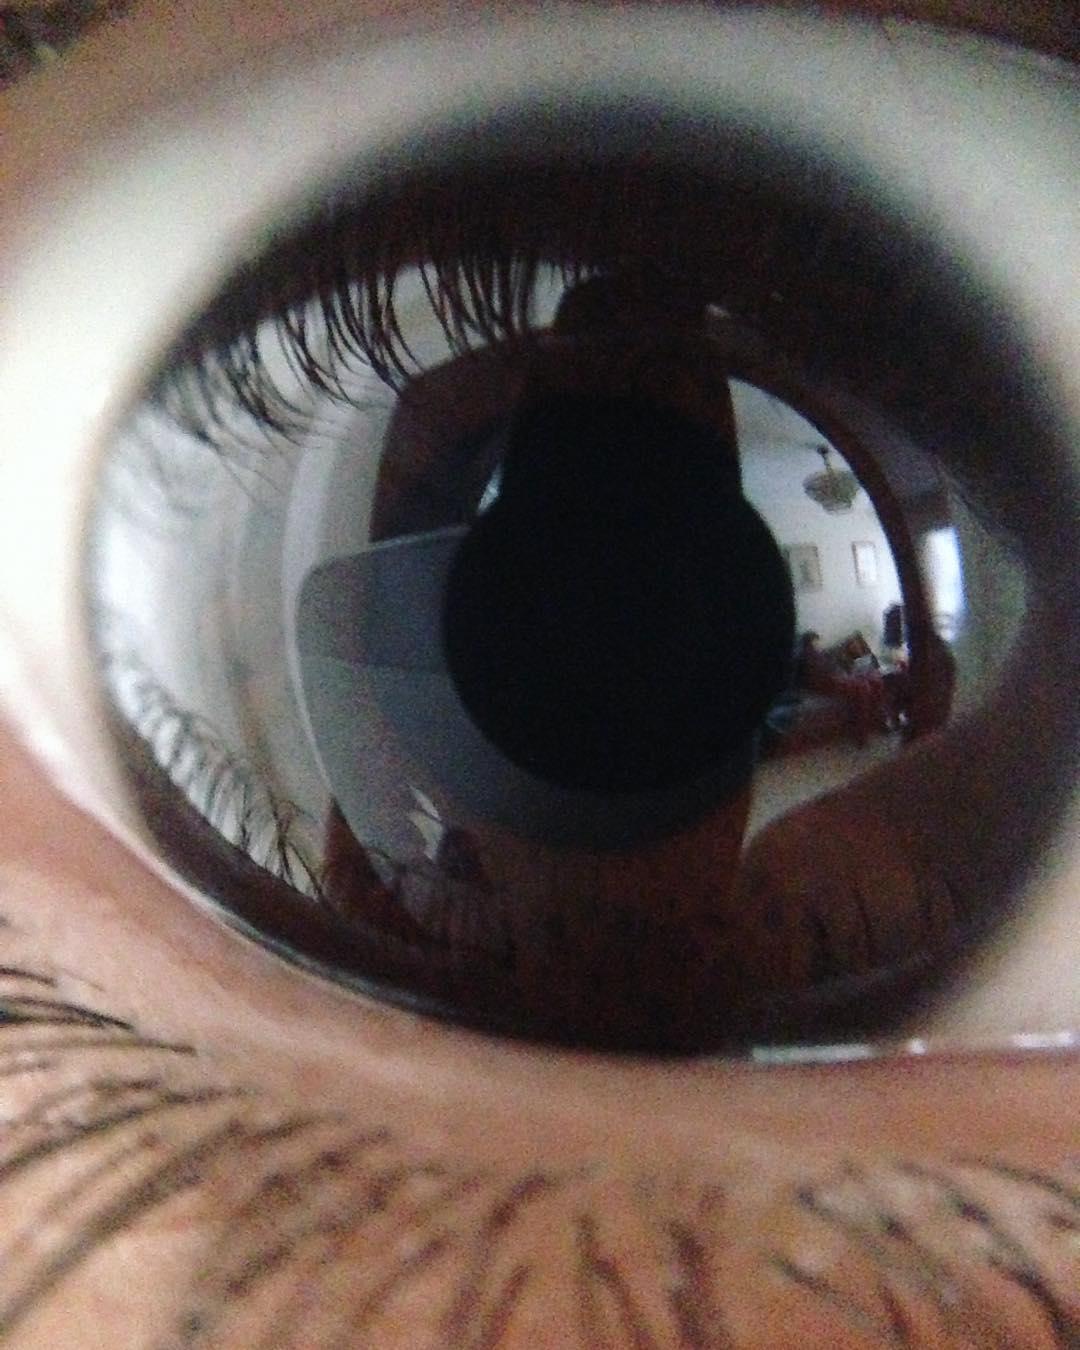 Este es tu ojo @dorisphanic